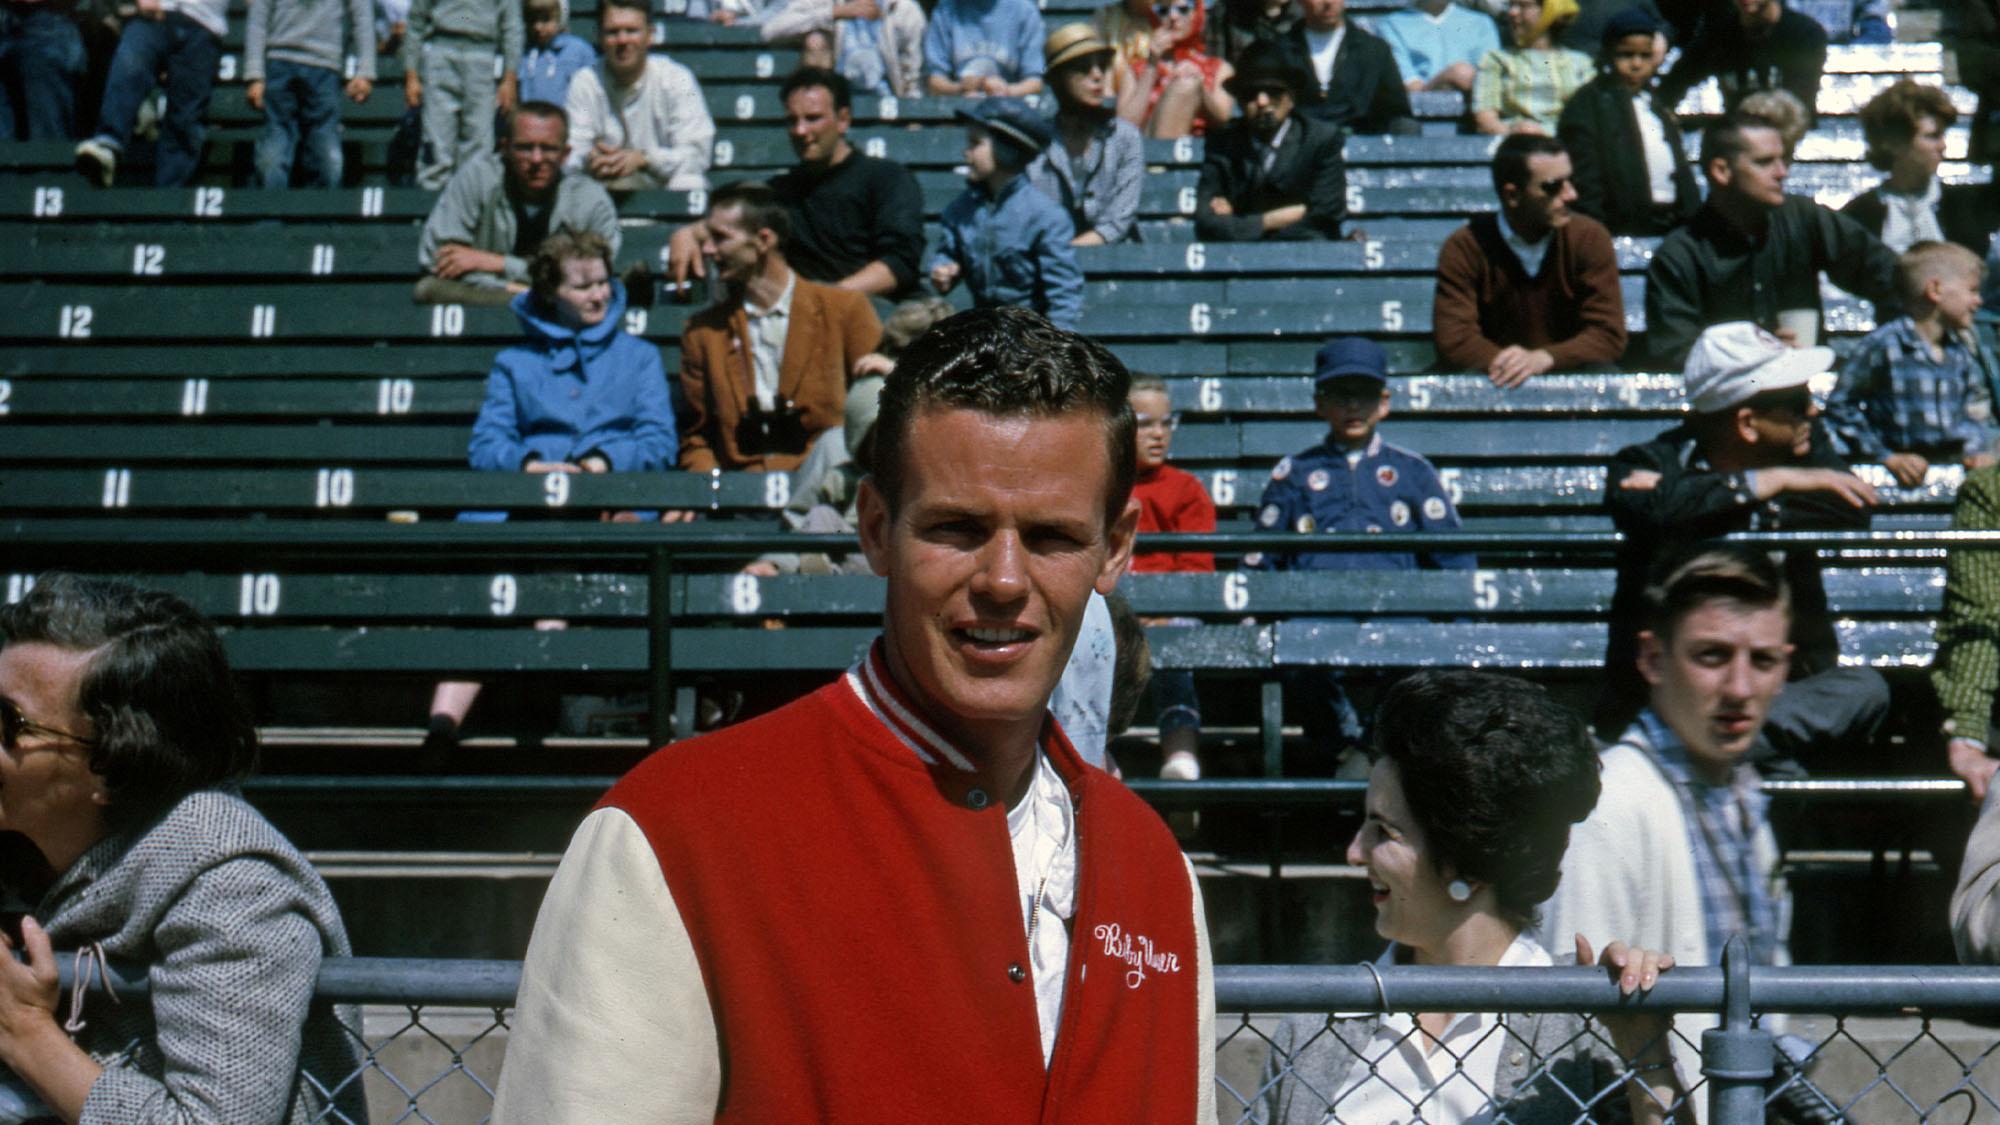 Bobby Unser rookie 63